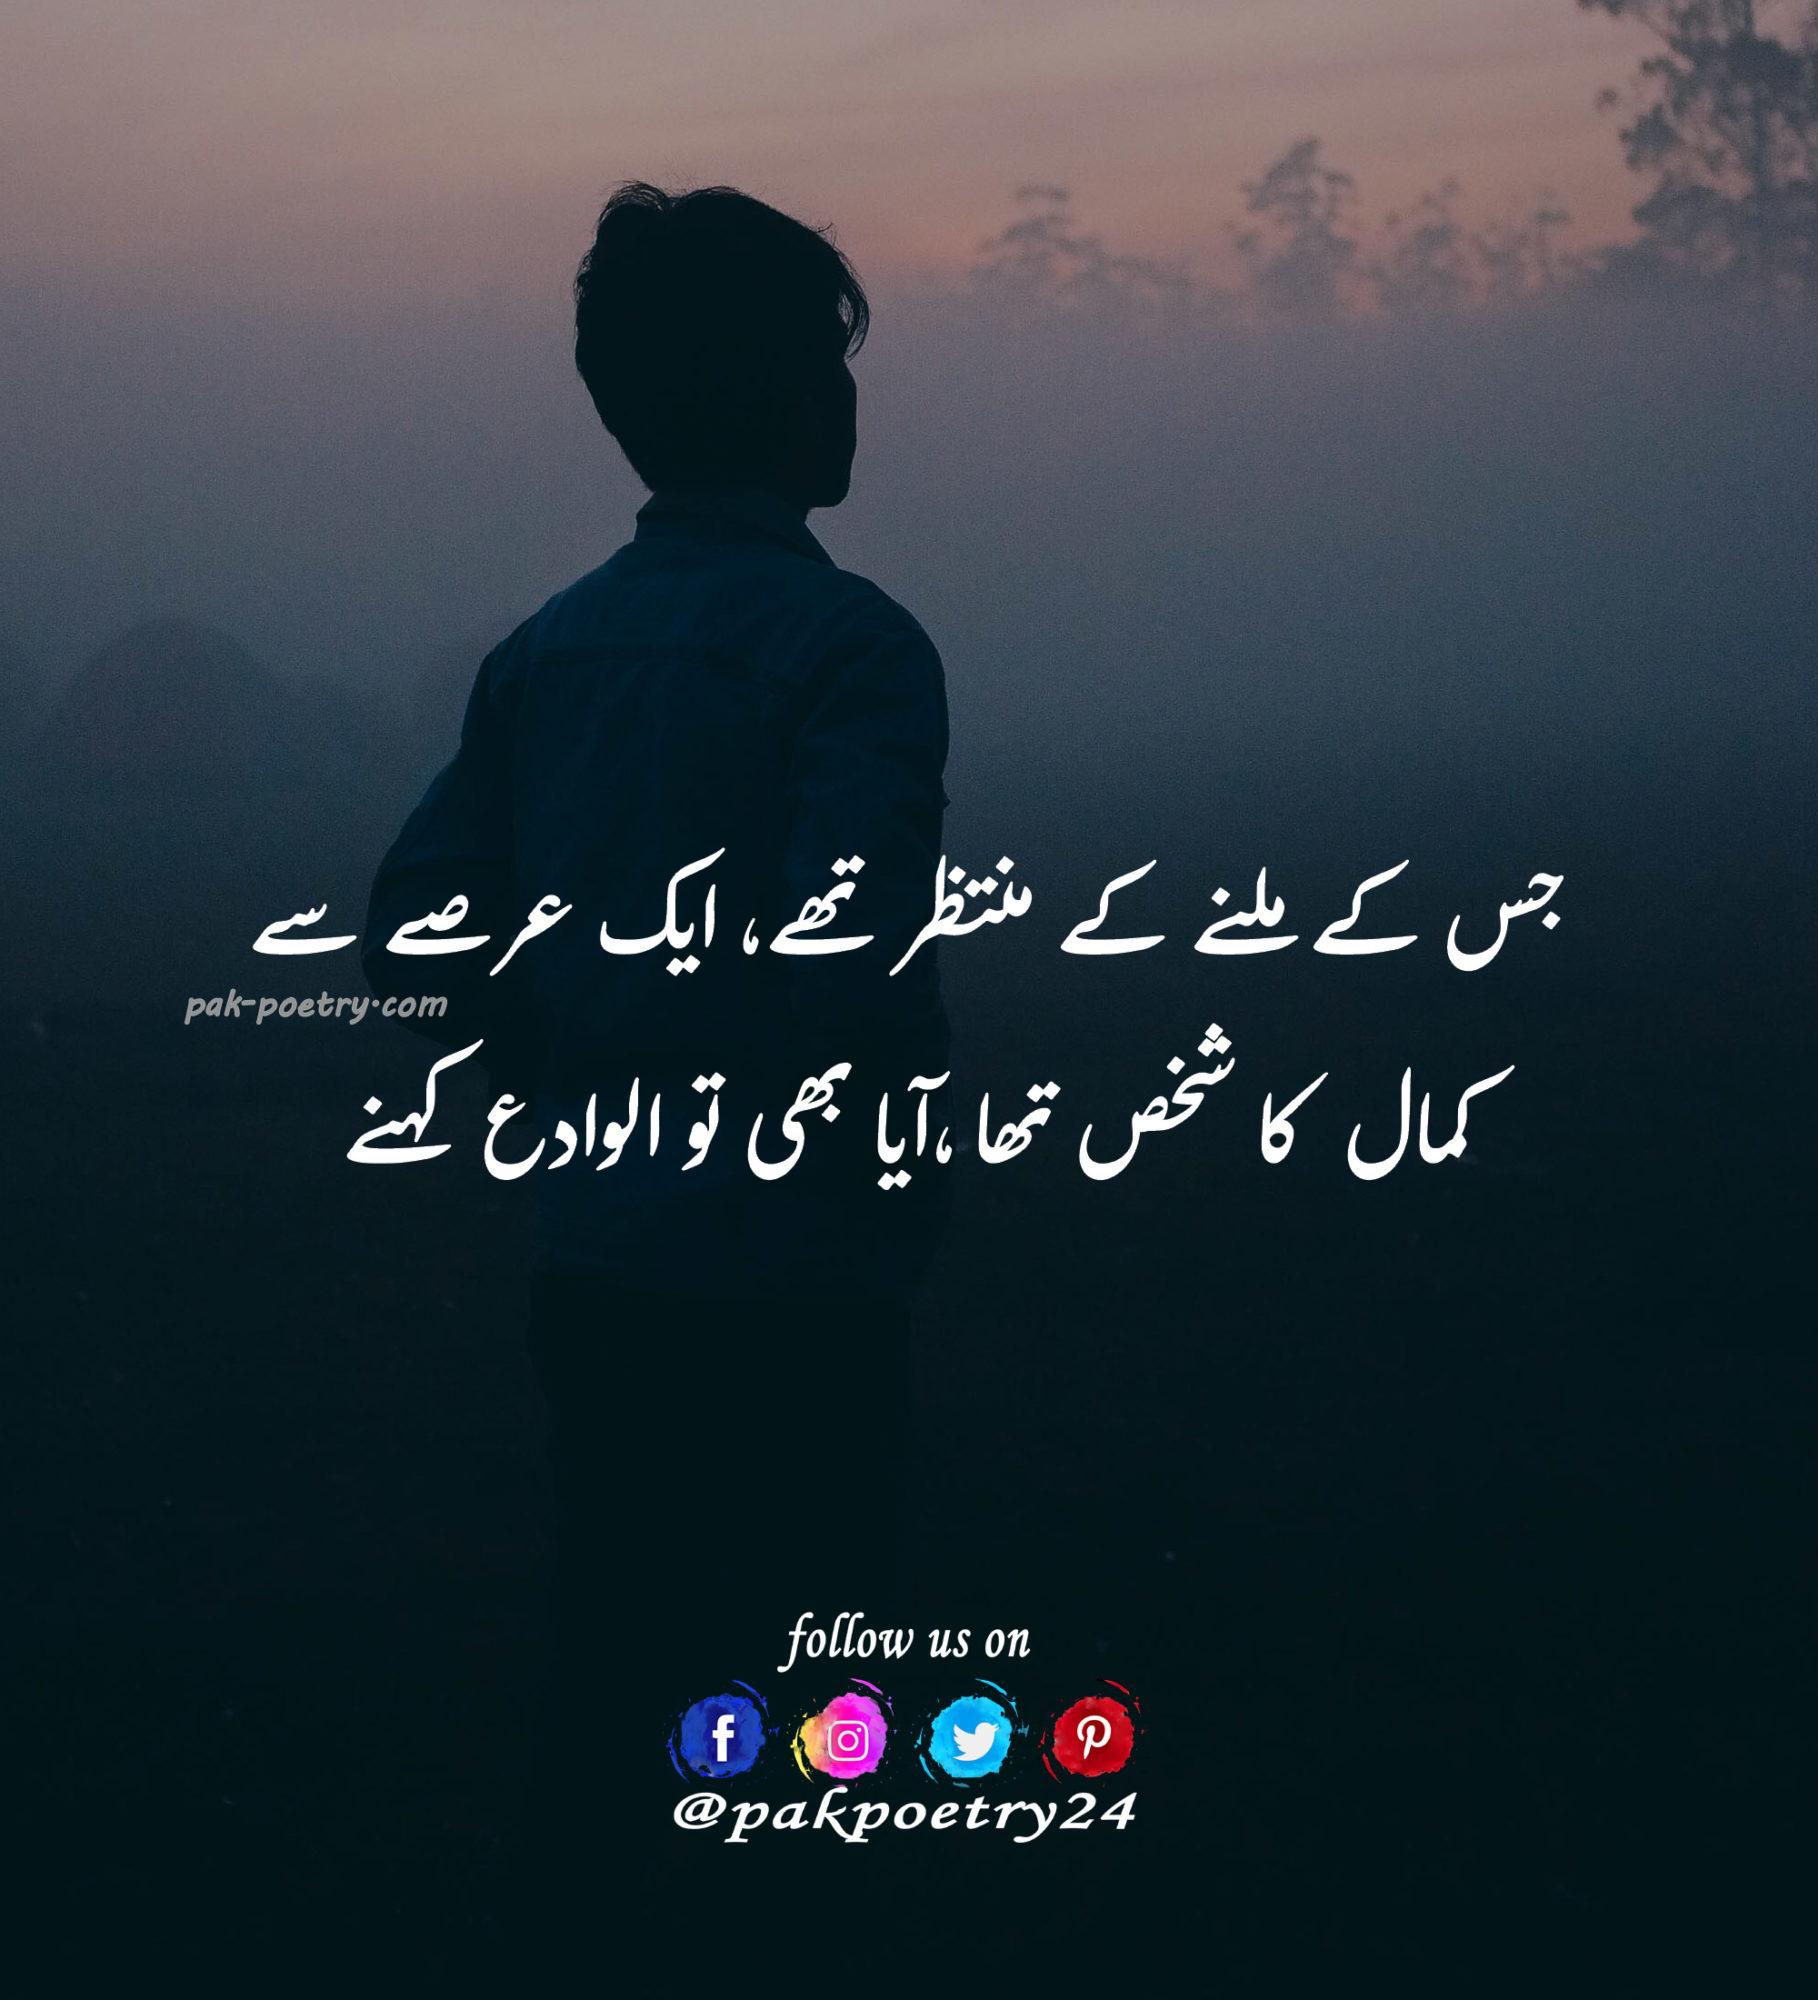 Sad poetry, sad poetry in urdu, poetry sad, sad poetry urdu, urdu sad poetry, sad poetry pics, poetry in urdu sad, Poetry in urdu, urdu poetry, poetry urdu,